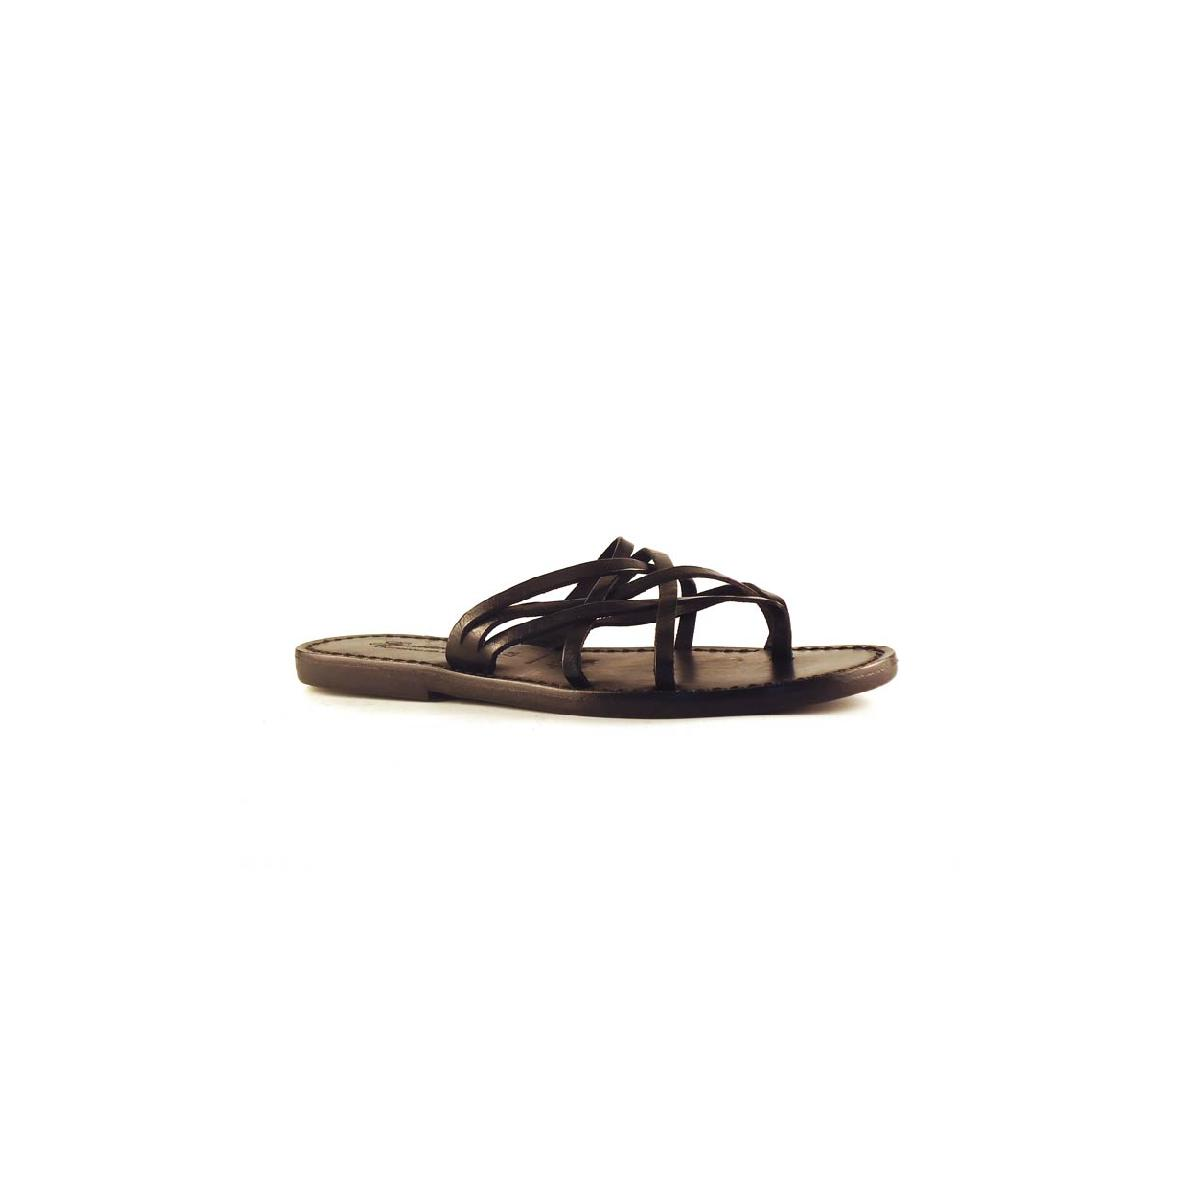 Handmade Black Braid Leather Womens Slippers Thongs With -6008